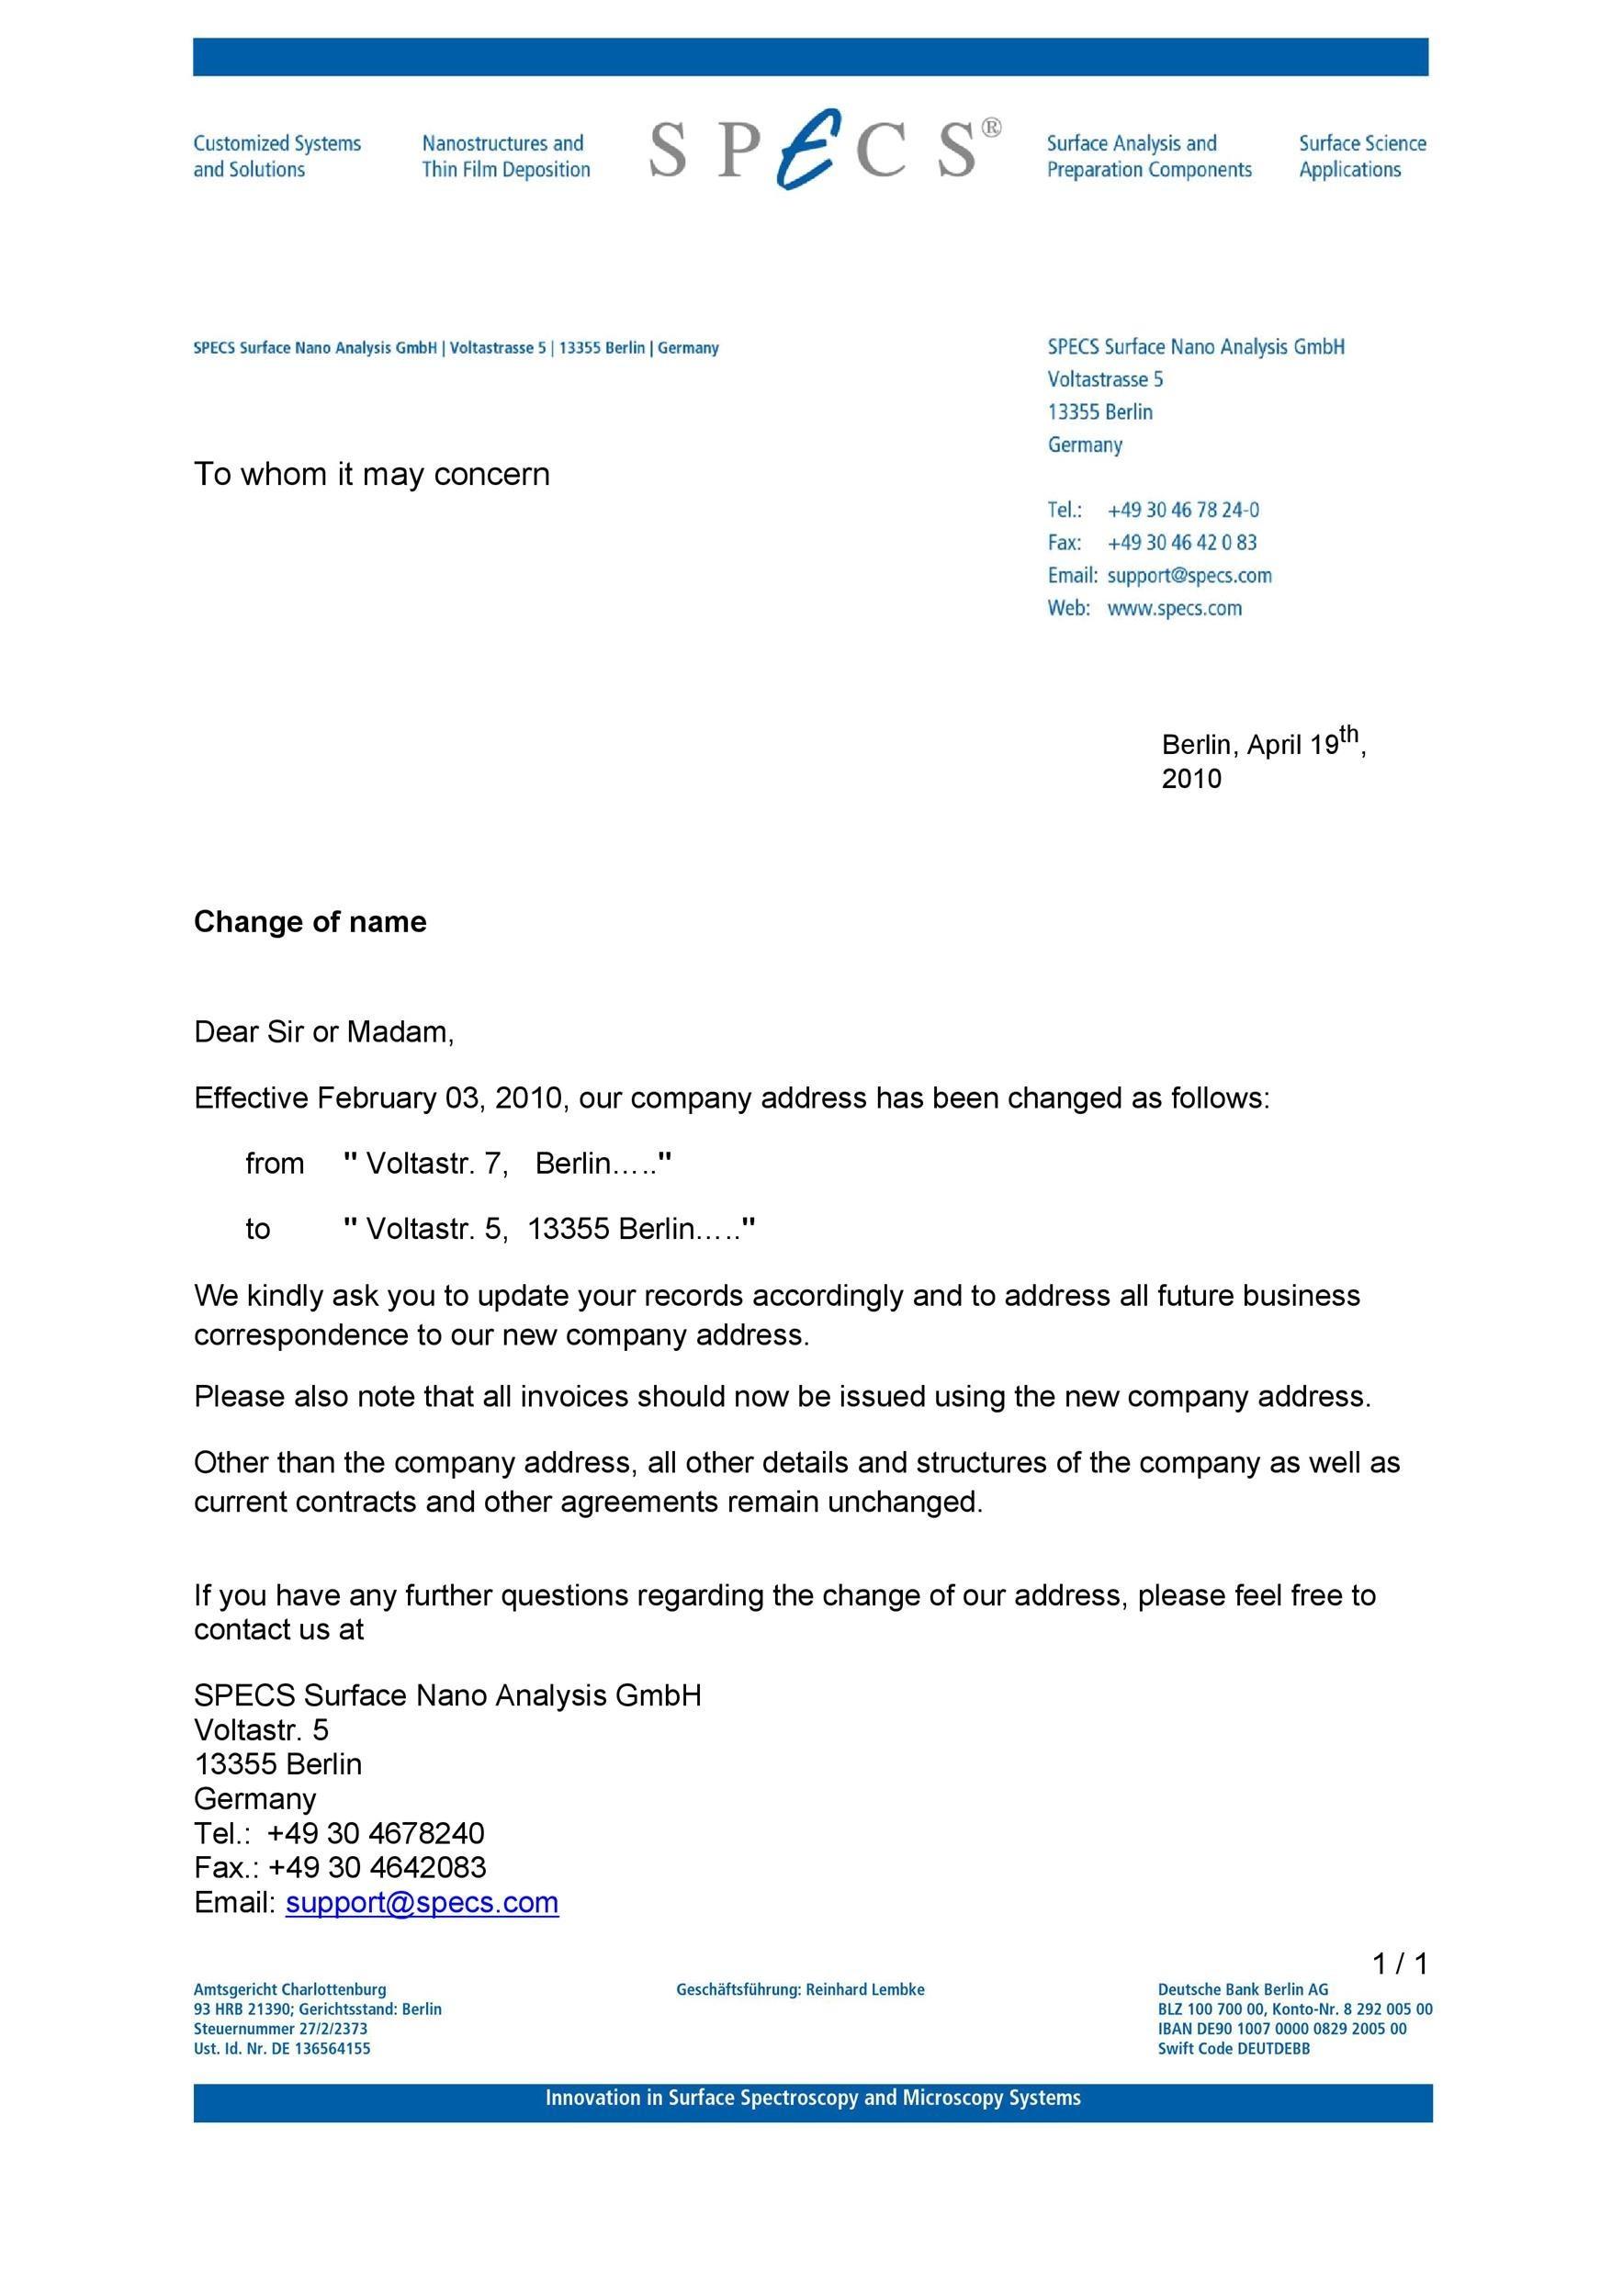 Free change of address letter 01